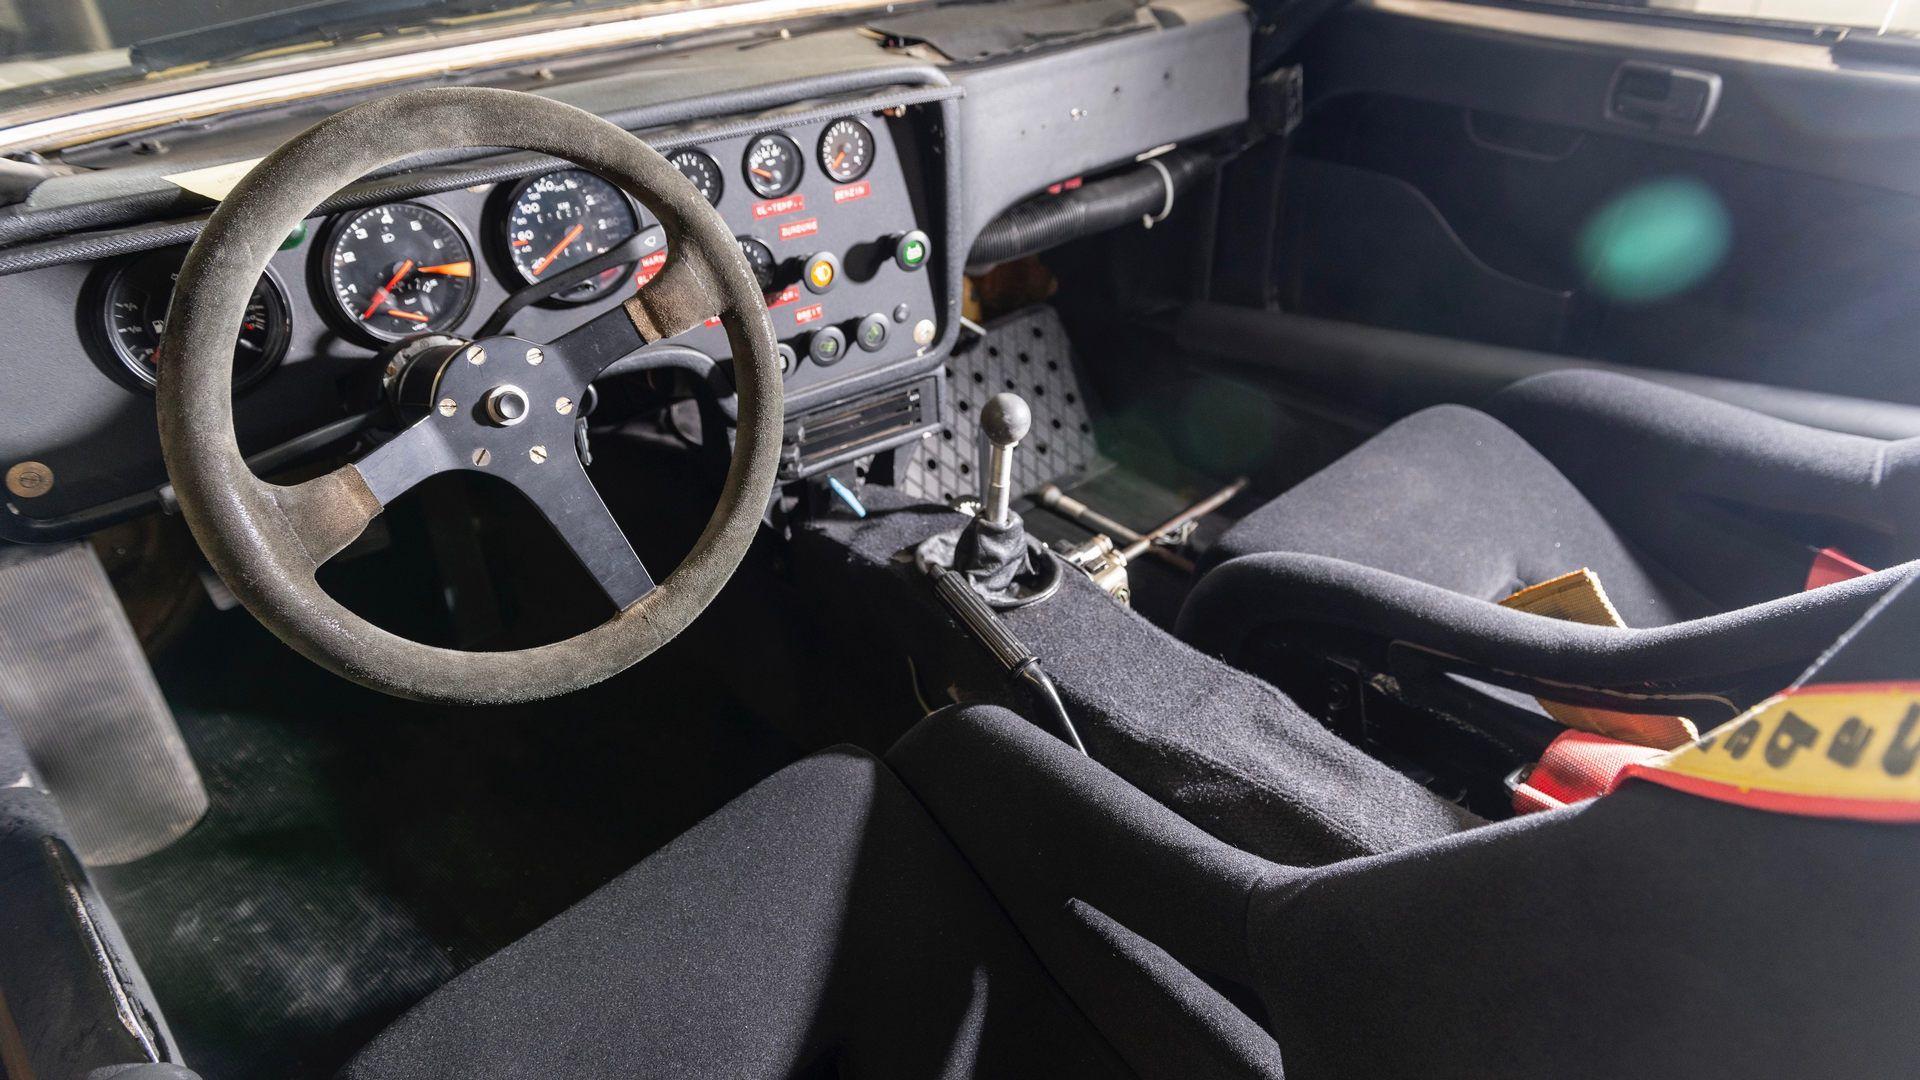 Porsche-924-Carrera-GTS-rally-car-Walter-Rohrl-36